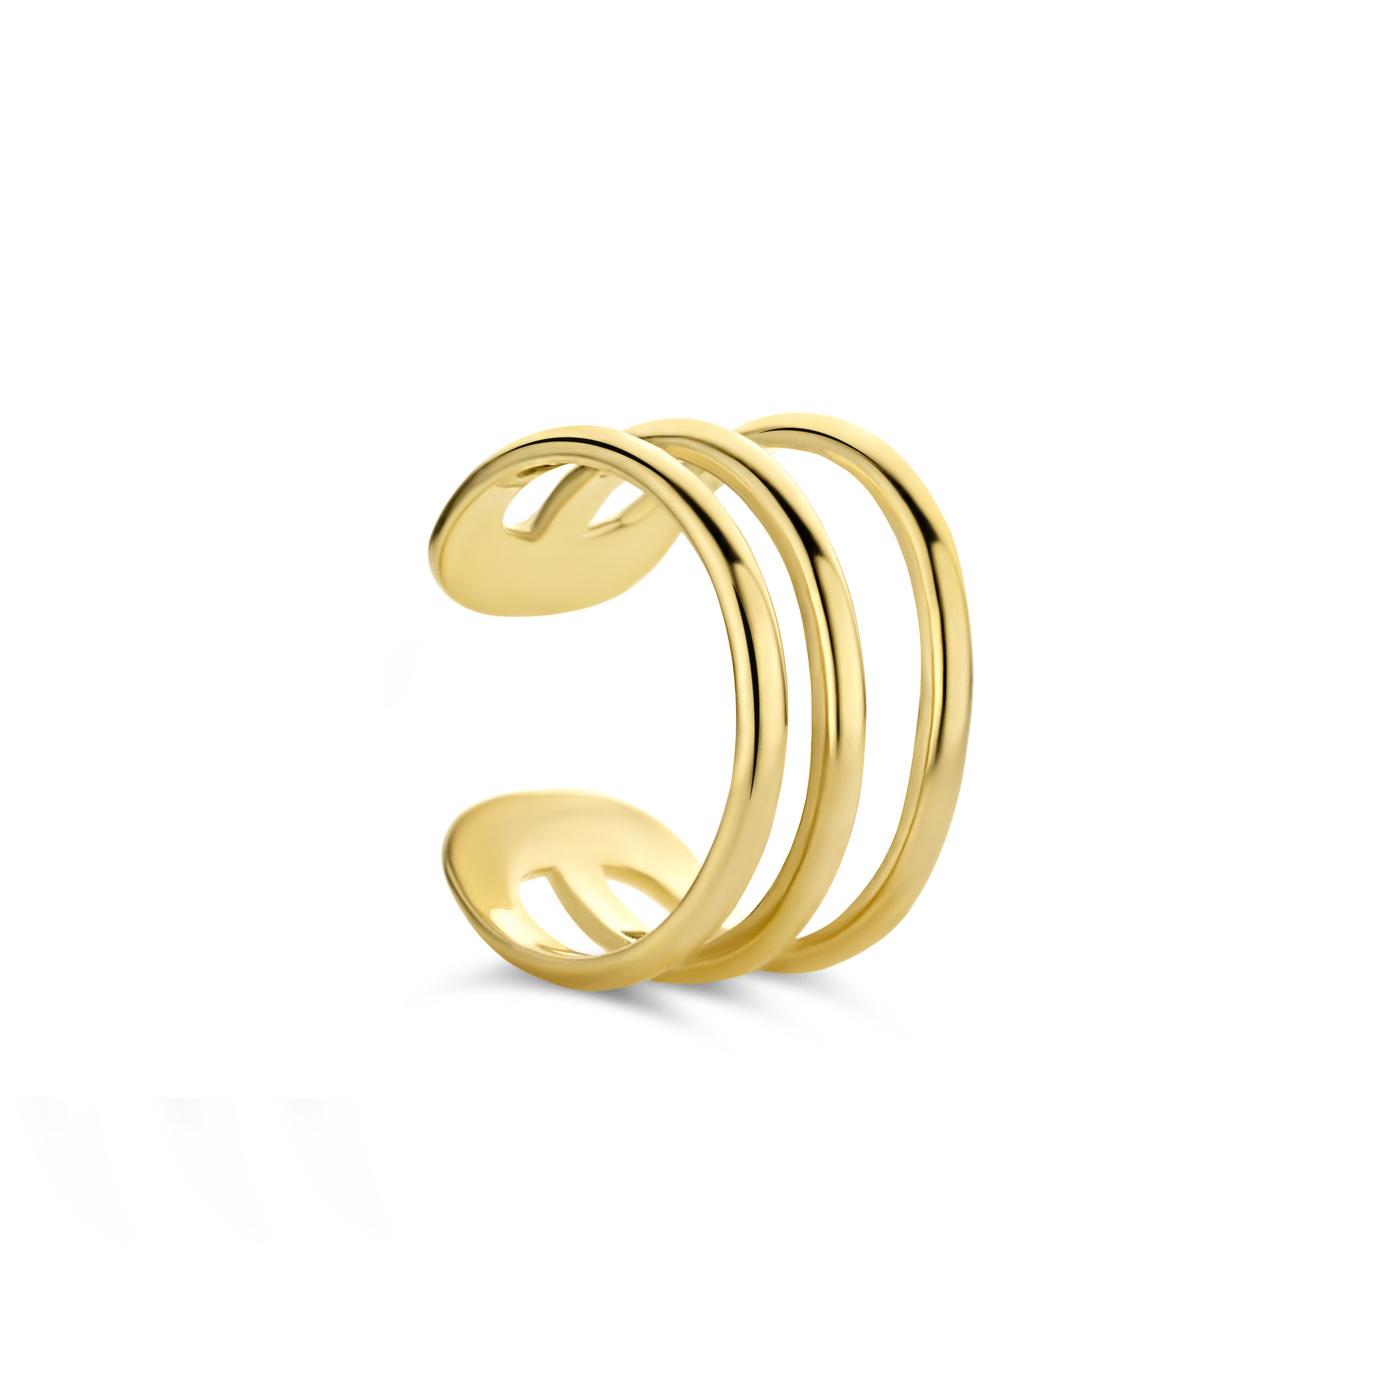 Isabel Bernard Ear cuff singolo in oro 14 carati Le Marais Chérie